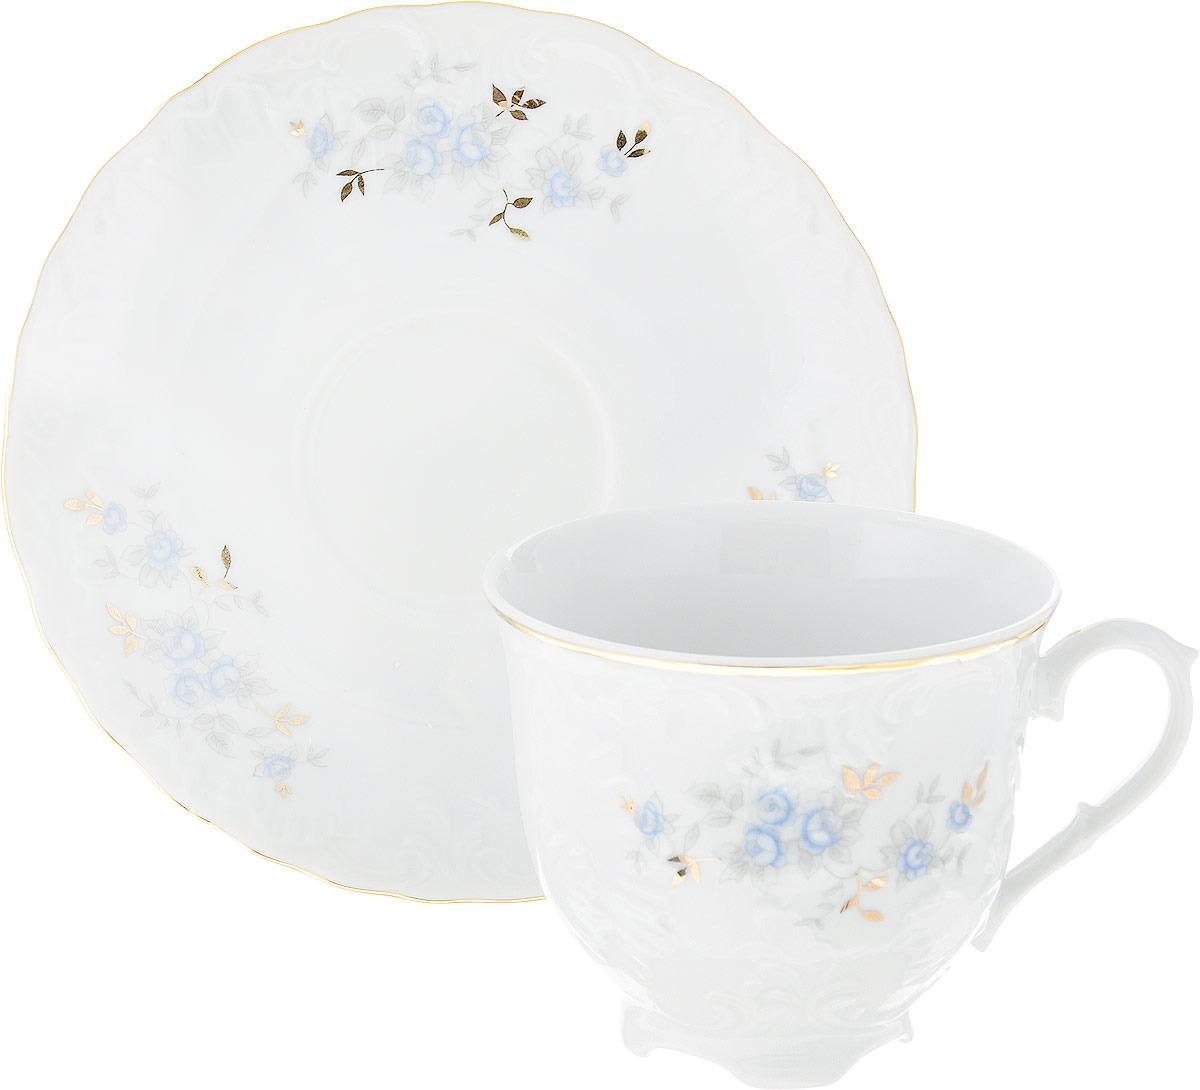 "Чайная пара Cmielow ""Rococo. Голубой цветок"", 250 мл, 2 предмета"